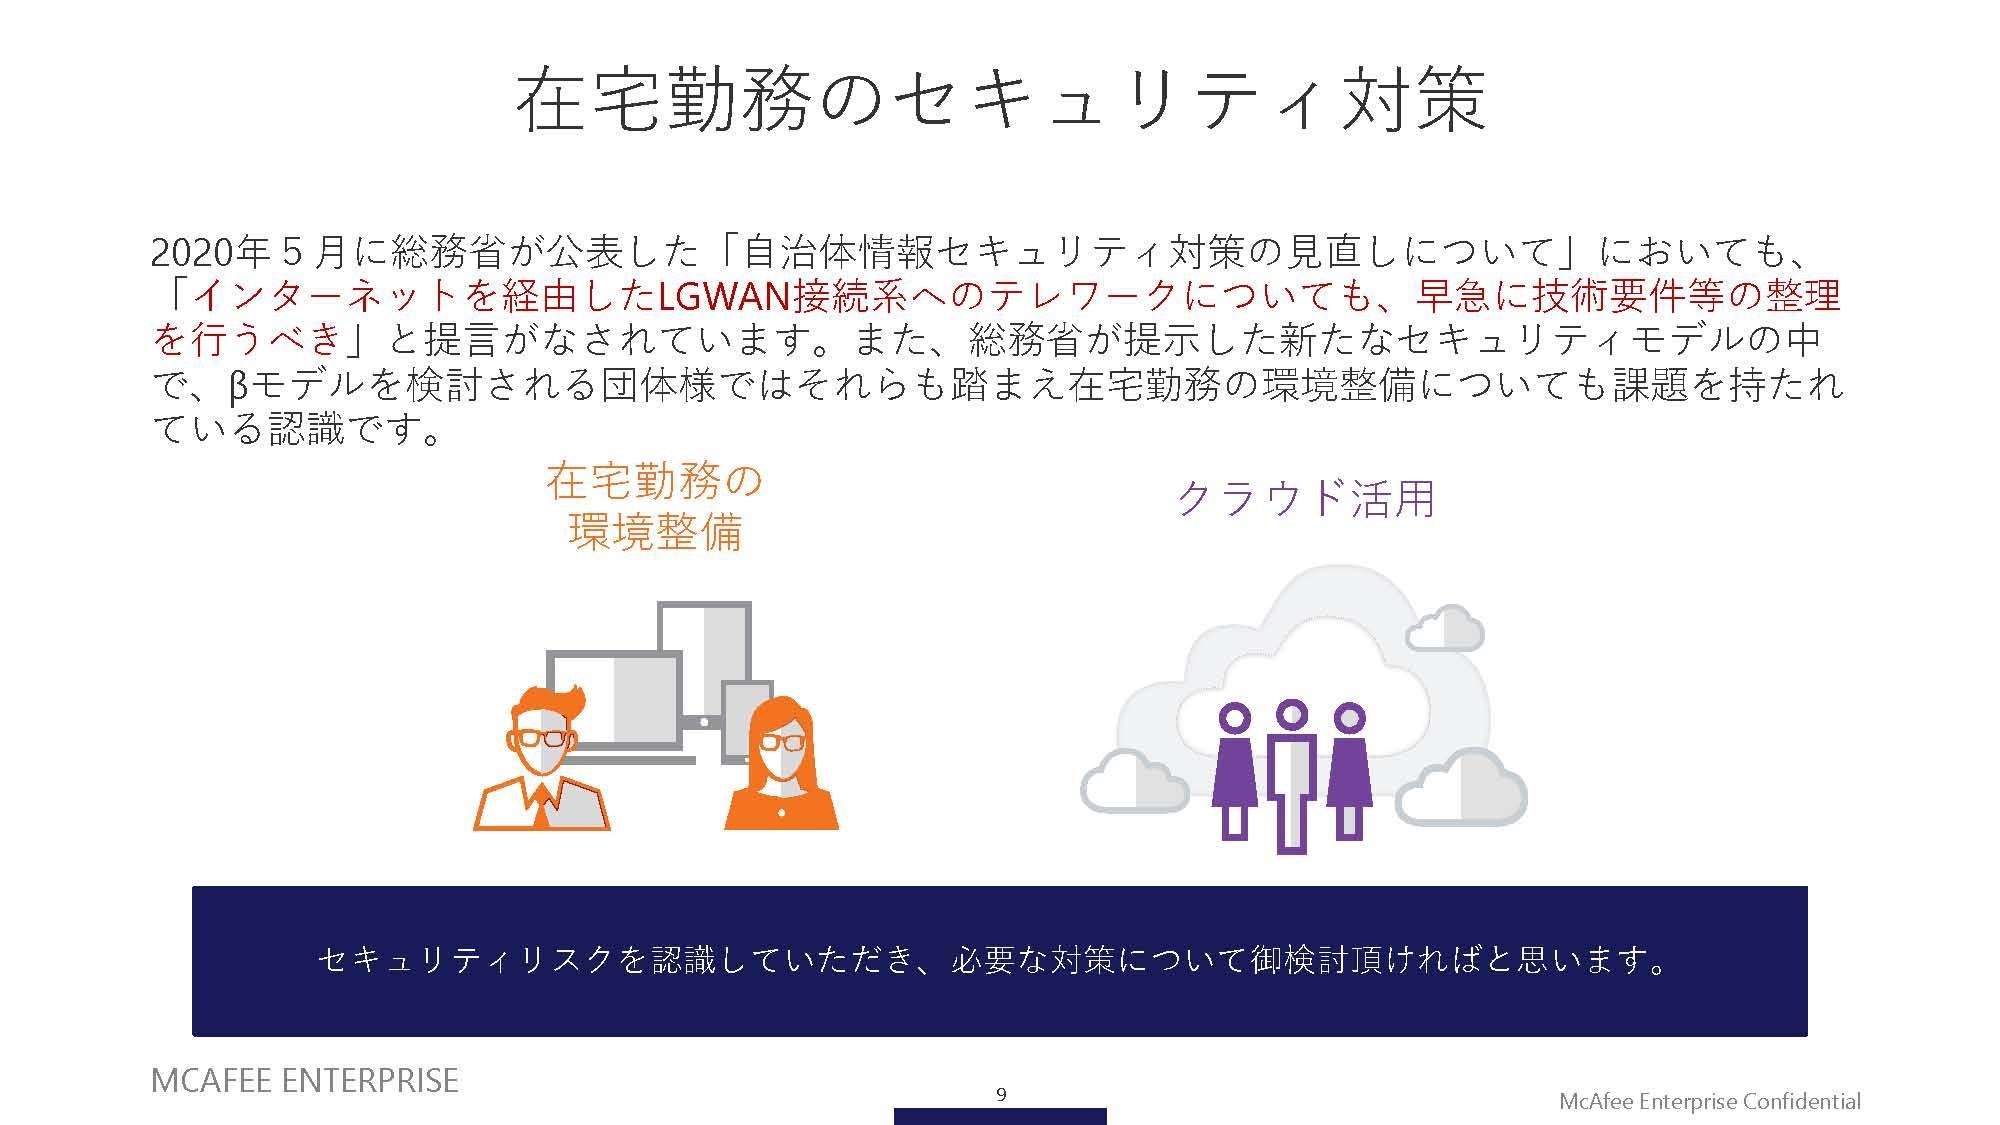 C:\Users\lma-Five\Desktop\オーバル セミレポ\採用画像jpg\5-09.jpg